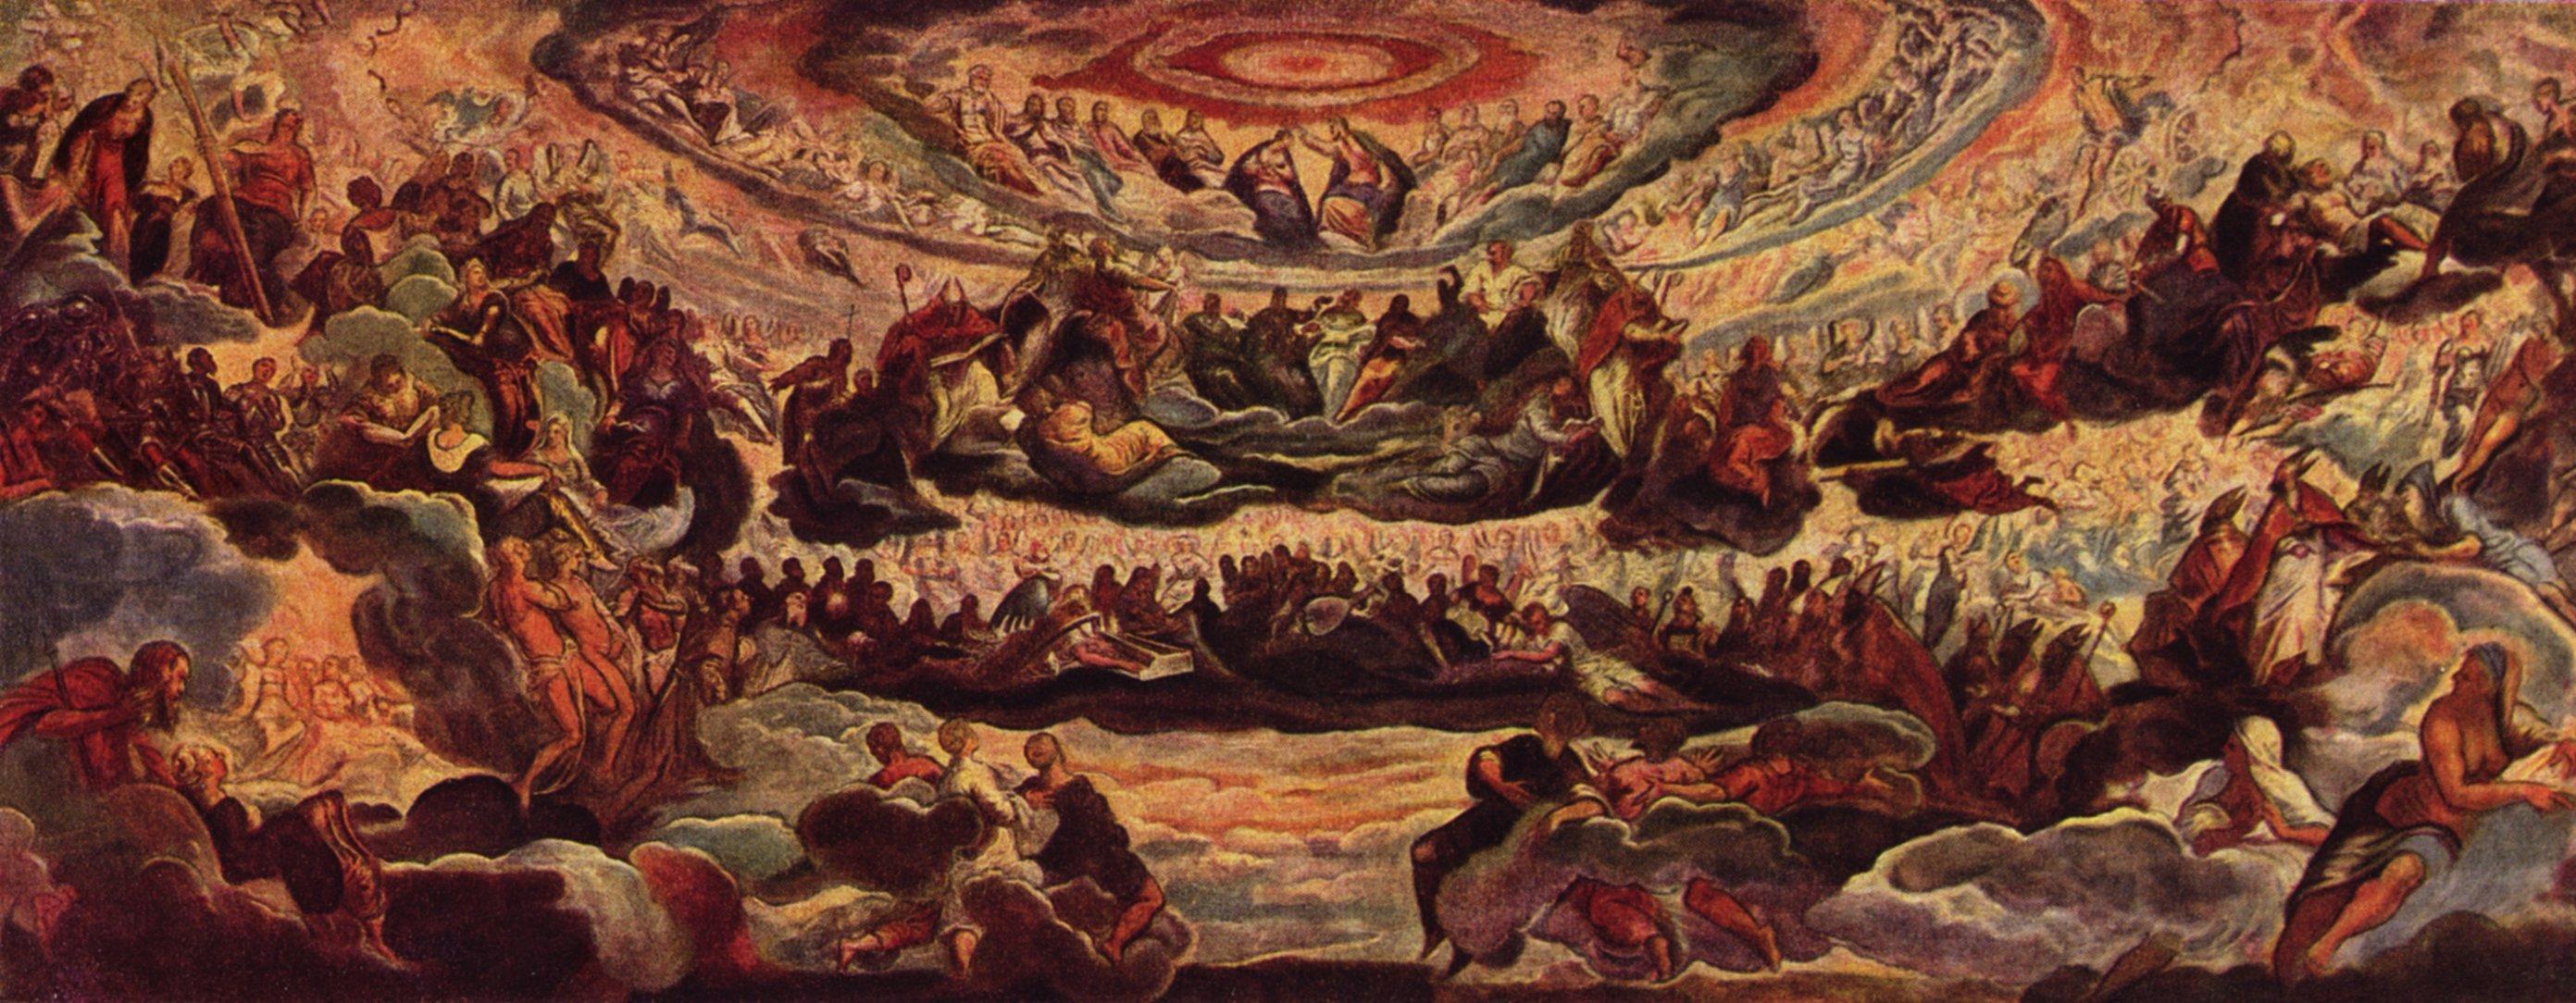 le paradis Tintoret.jpg